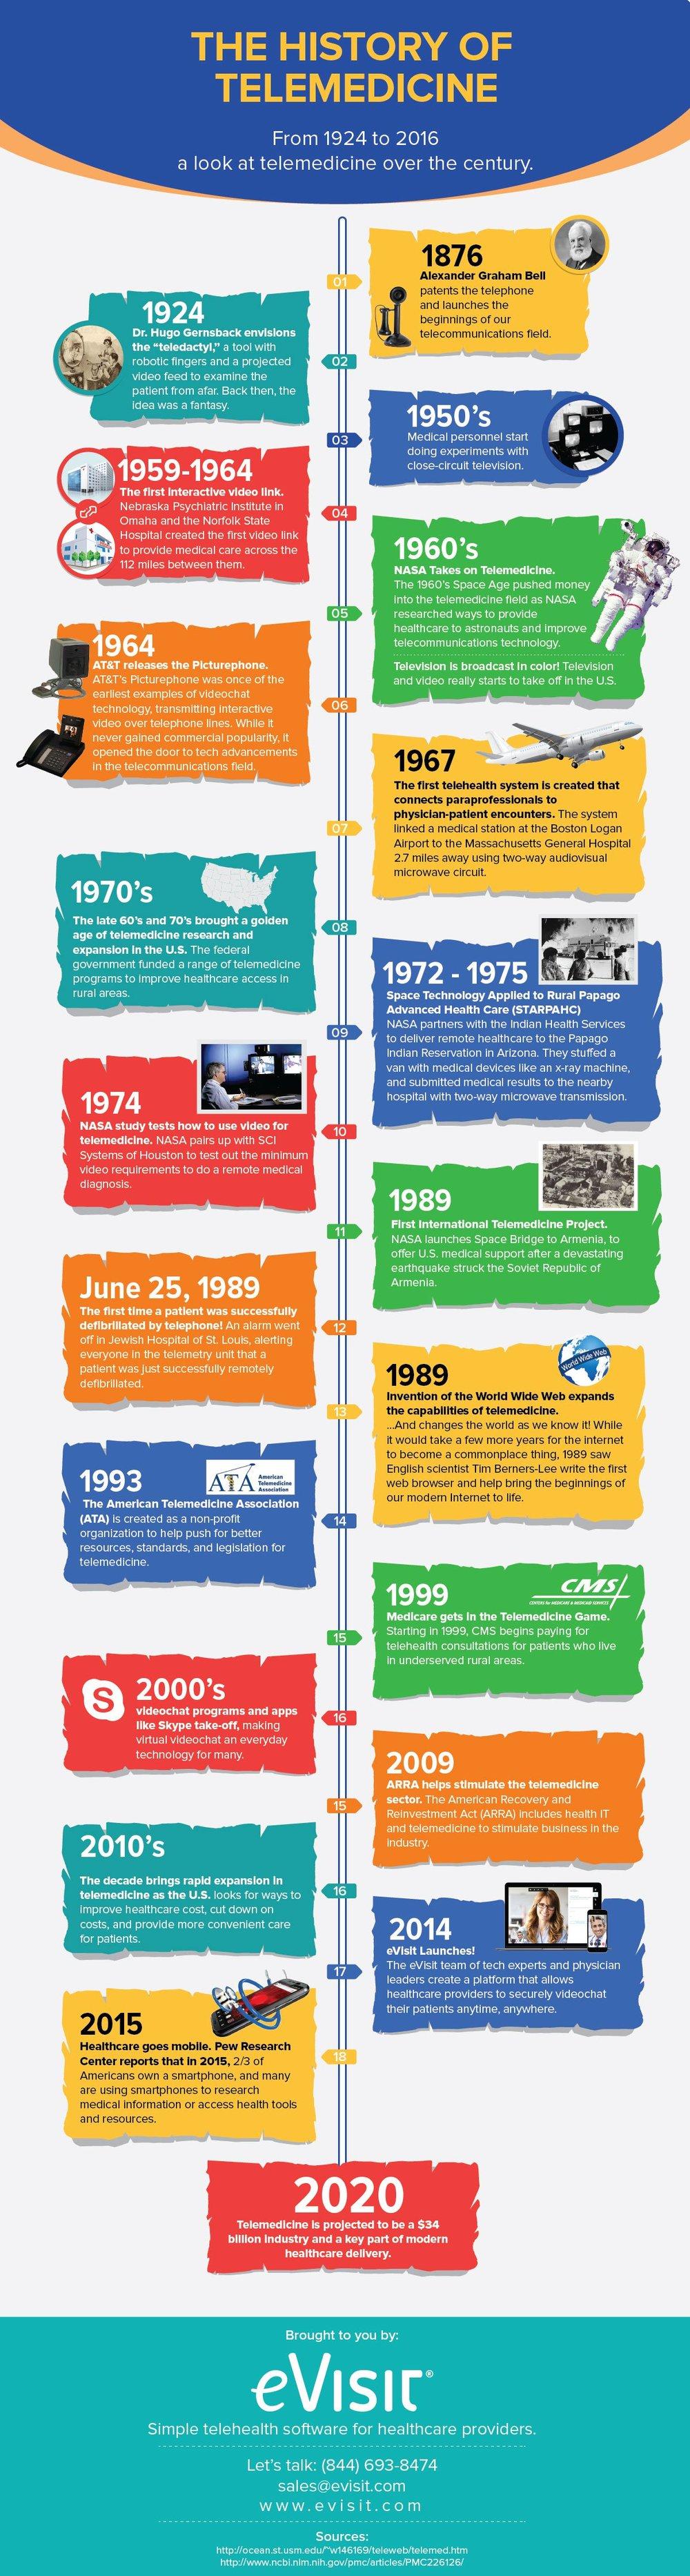 Evisit-History-of-Telemedicine-Infographic.jpg